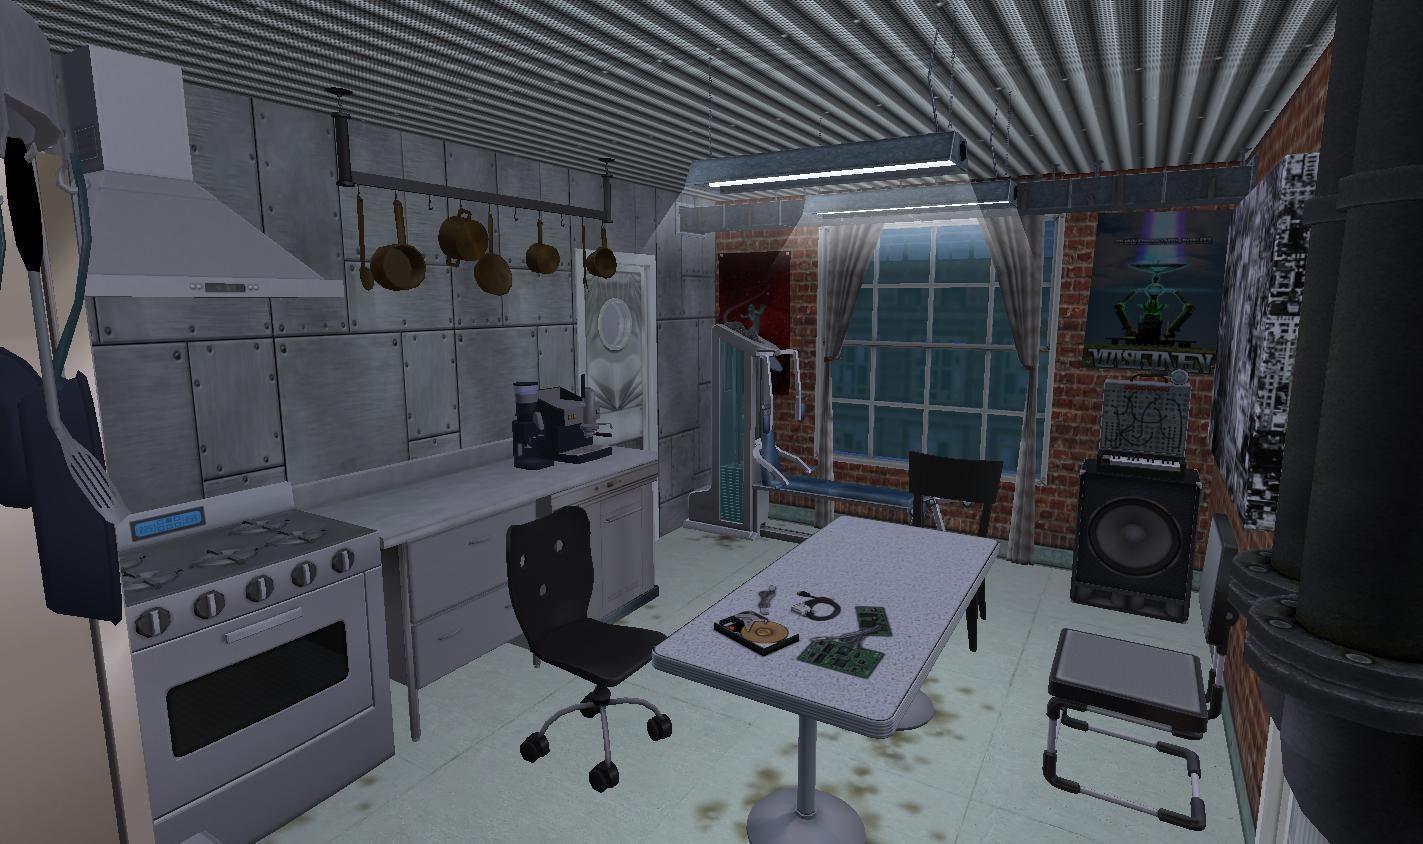 Mod The Sims Cyberpunk BioLab + Home Business NO CC